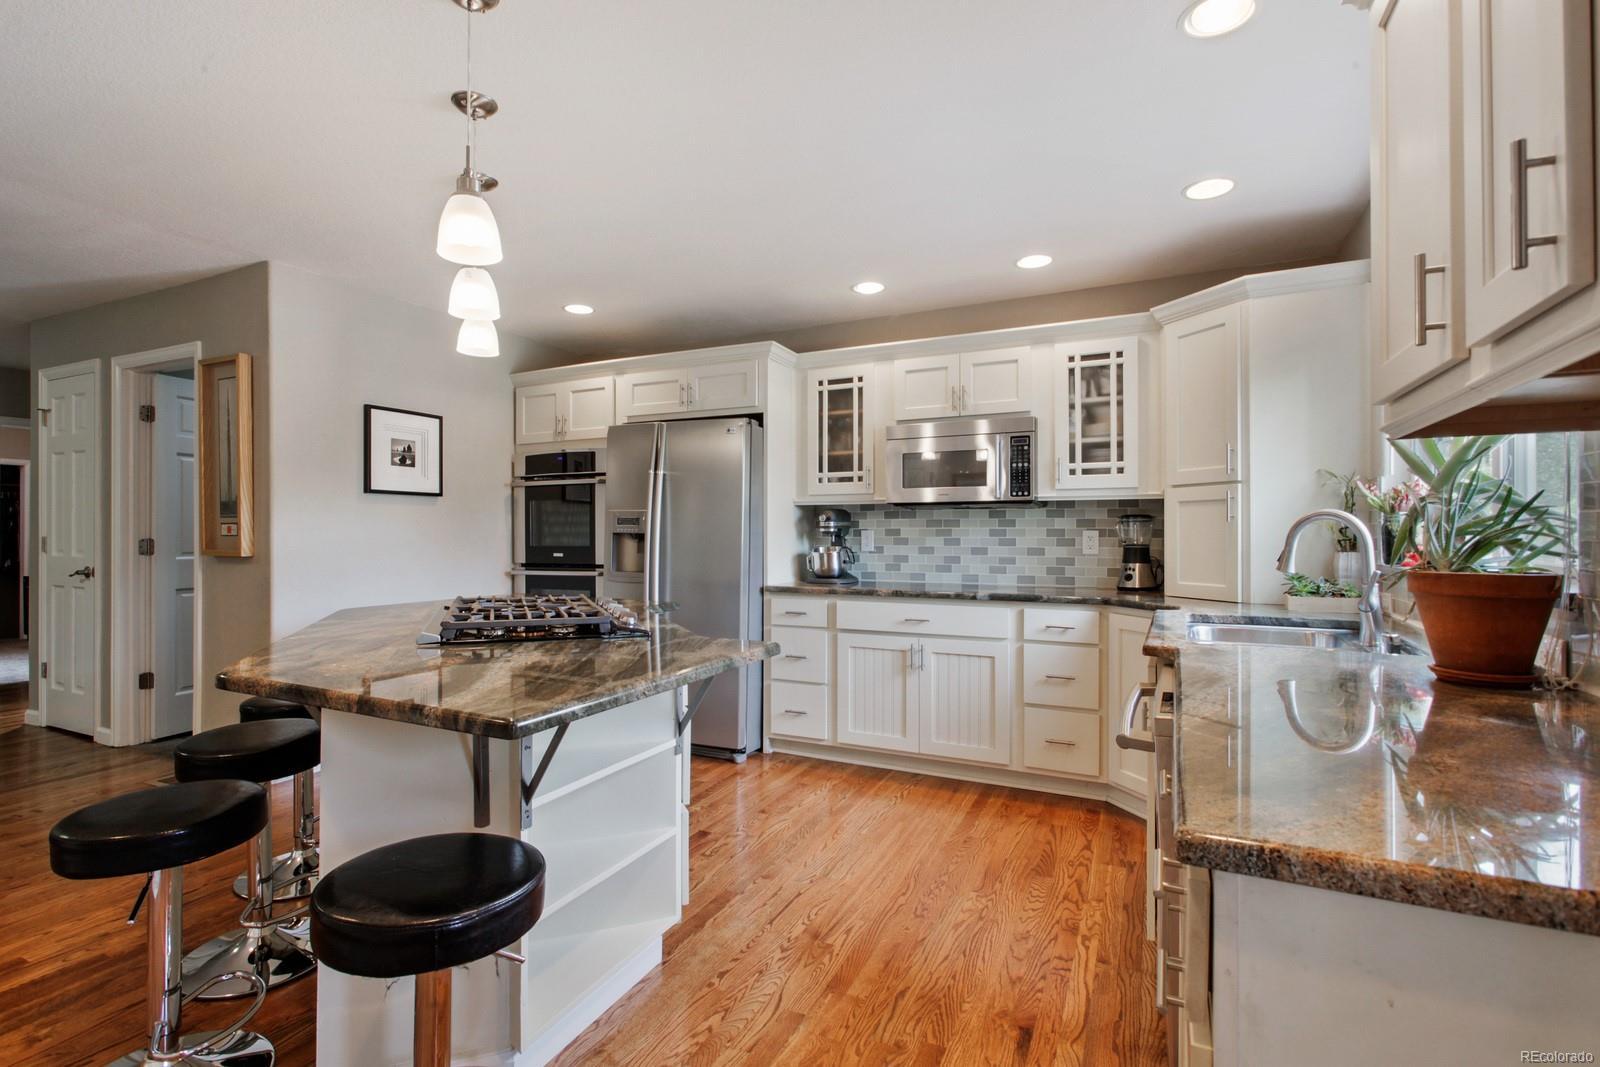 2426 Garland Street, Lakewood, CO 80215 - Lakewood, CO real estate listing